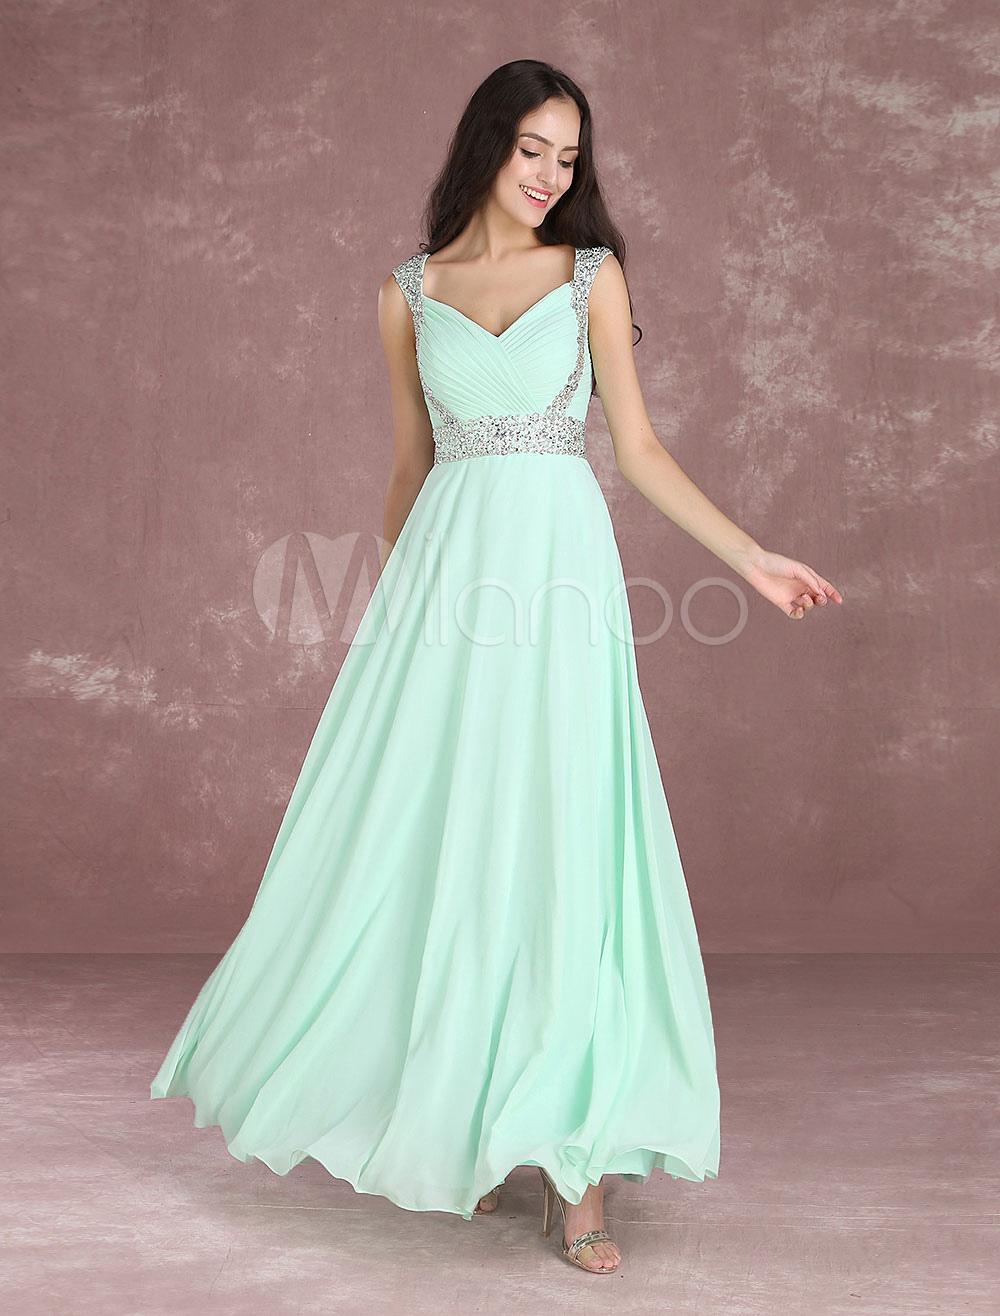 Chiffon Prom Dress Long 2018 Pastel Green Rhinestones Beaded Occasion Dress Sleeveless Pleated Floor Length Party Dress (Wedding Prom Dresses) photo